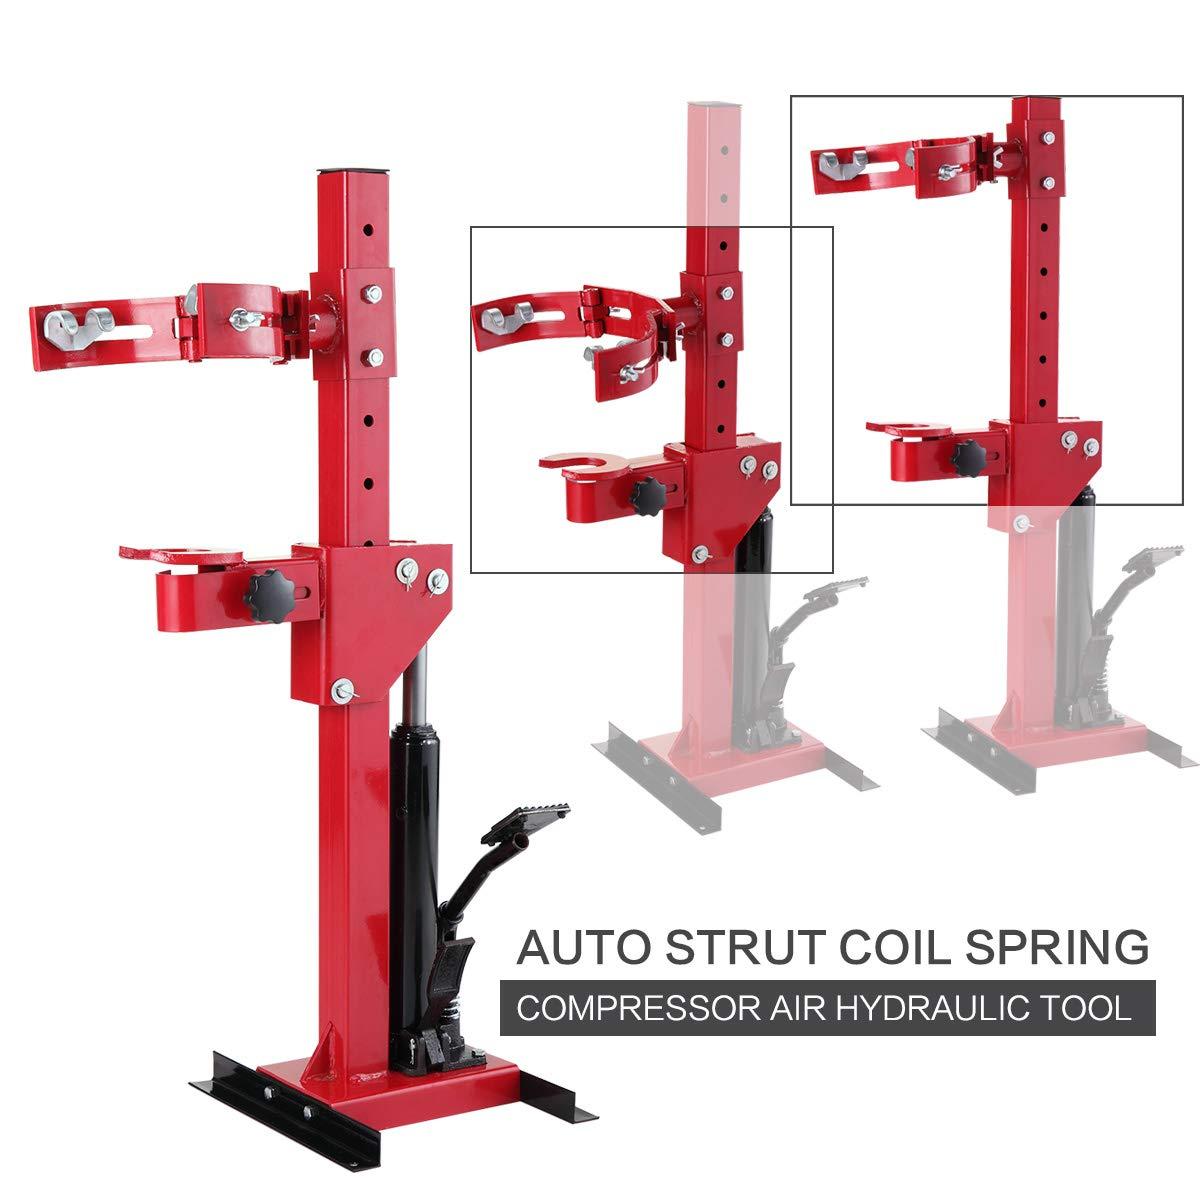 BWM.Co 3 Ton Auto Strut Coil Spring Compressor Hydraulic Tool HD Heavy Duty Auto Tool